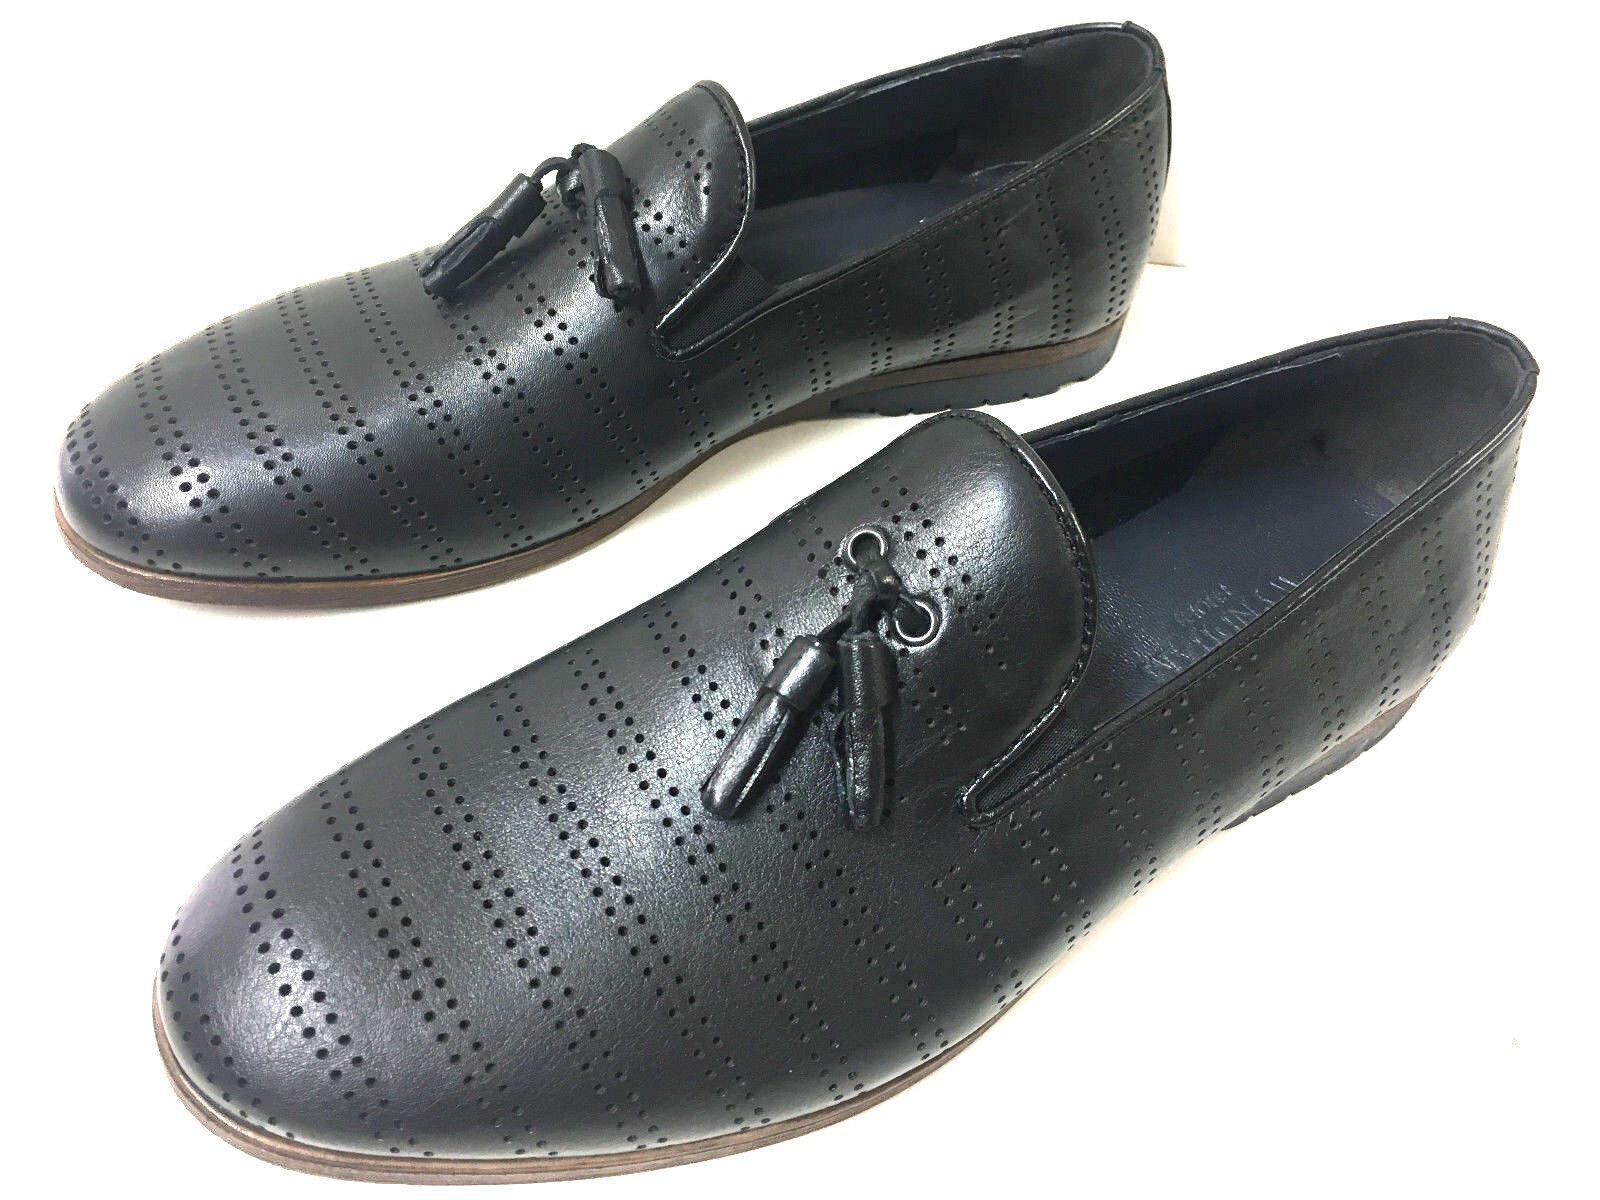 Neue MODE ALESSANDRINI mocassino loafer Scarpe Nero in Pelle Uomo Scarpe loafer design foro Slipper 22dcb2